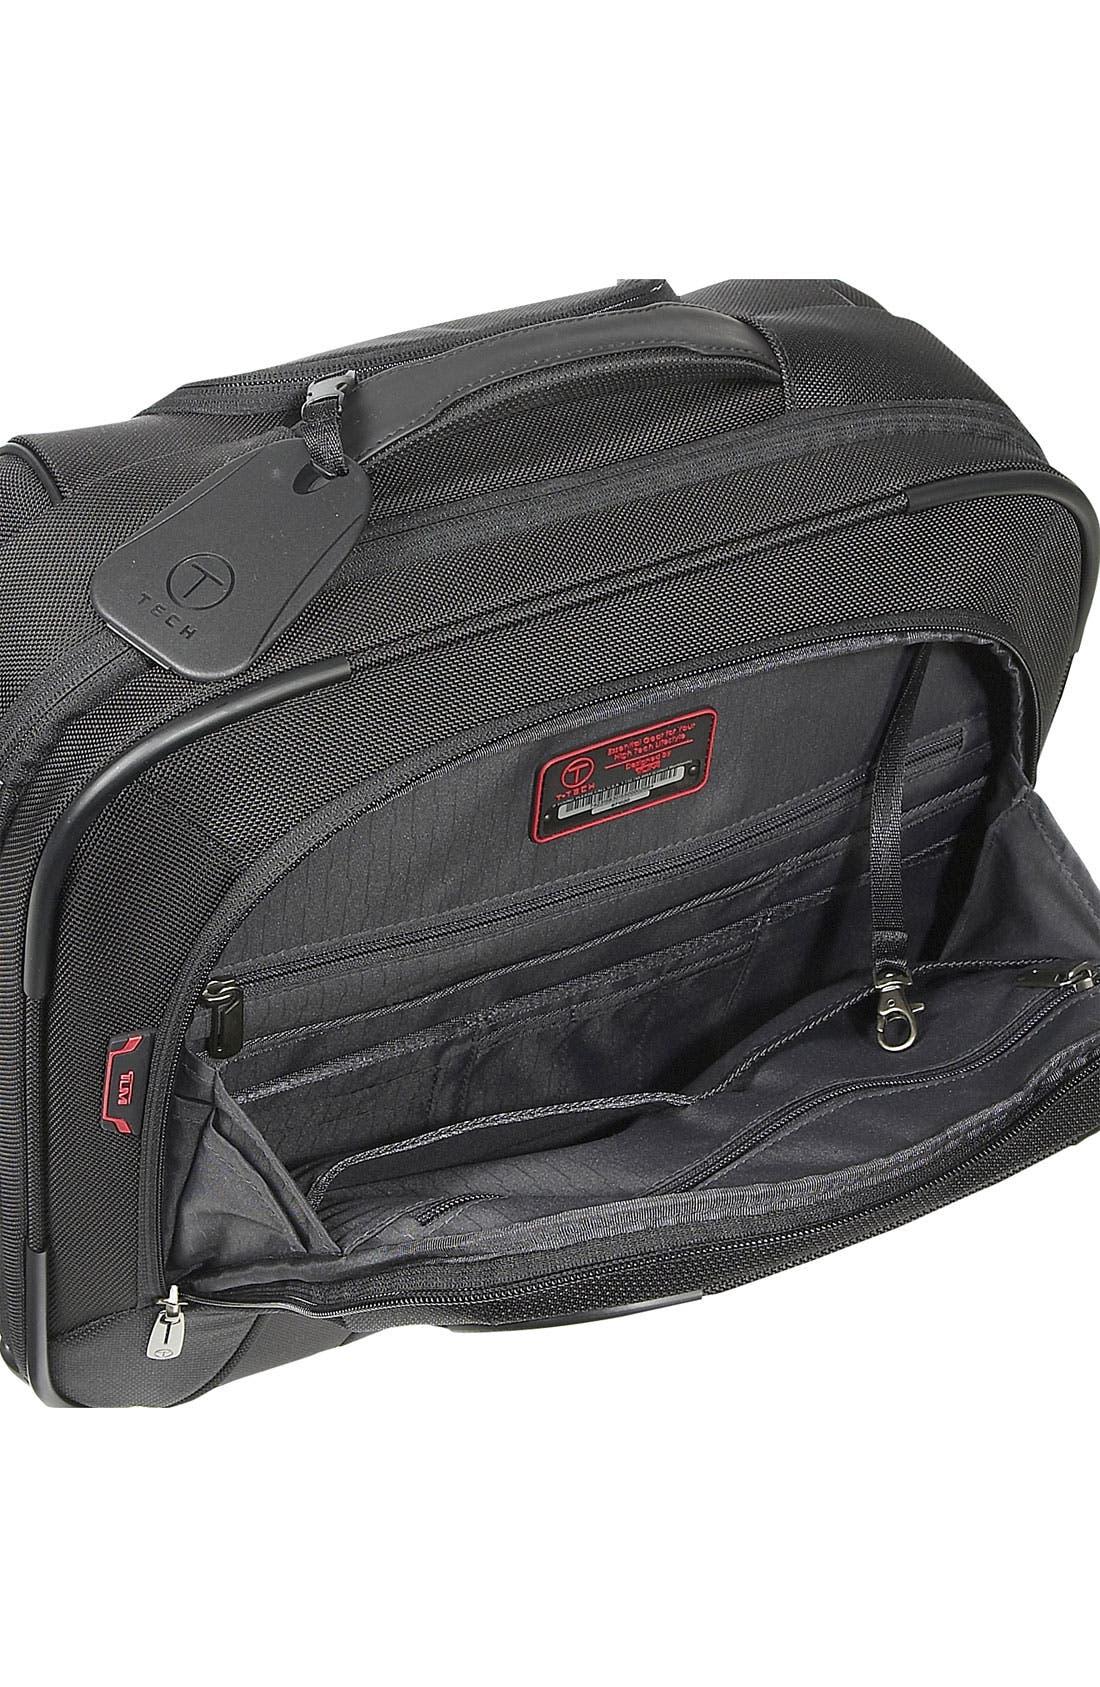 Alternate Image 4  - T-Tech by Tumi 'Presidio MacArthur' Wheeled Compact Laptop Briefcase